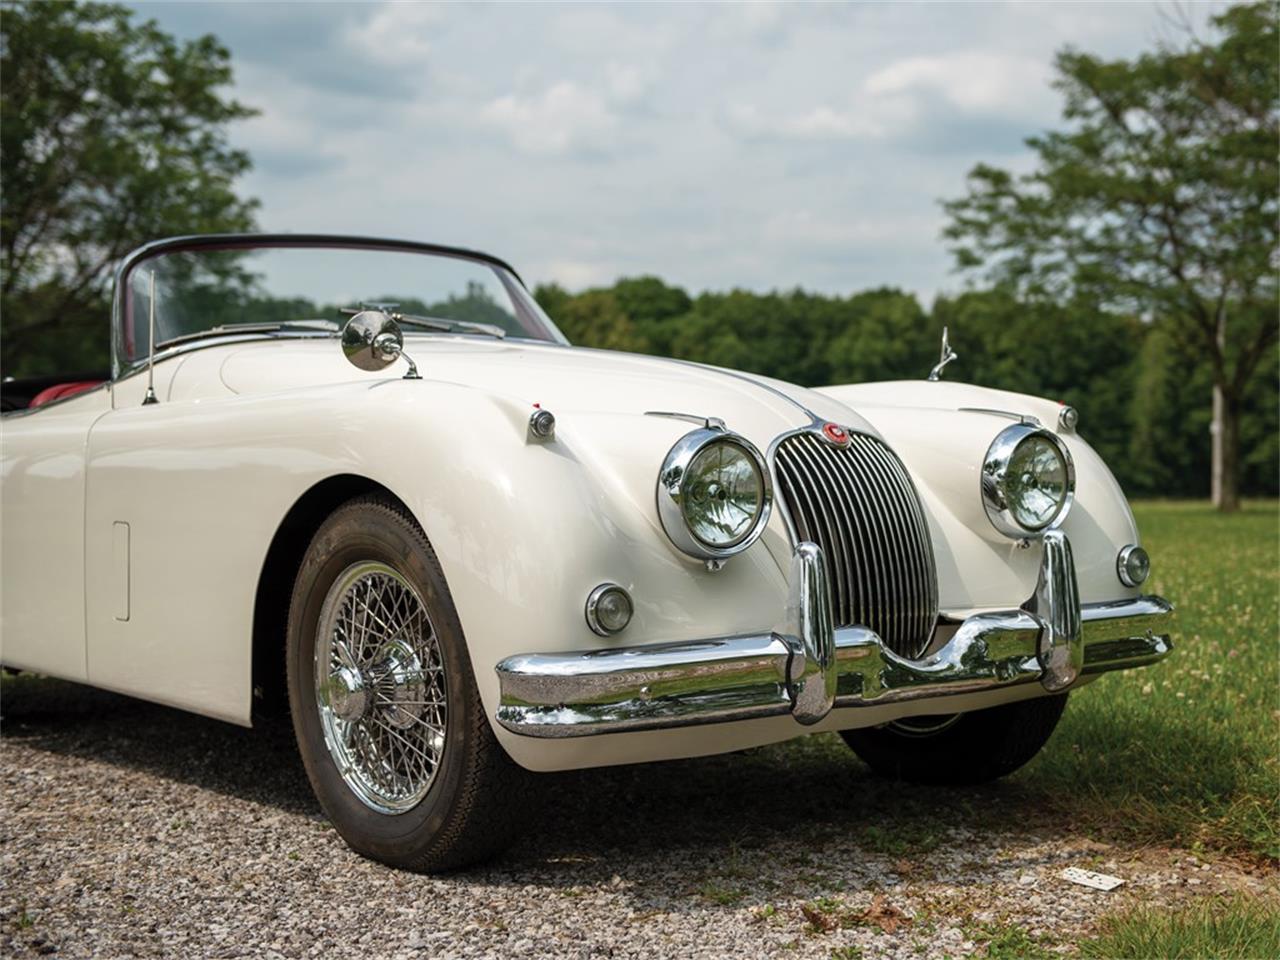 1958 Jaguar XK150 for sale in Auburn, IN / ClassicCarsBay.com